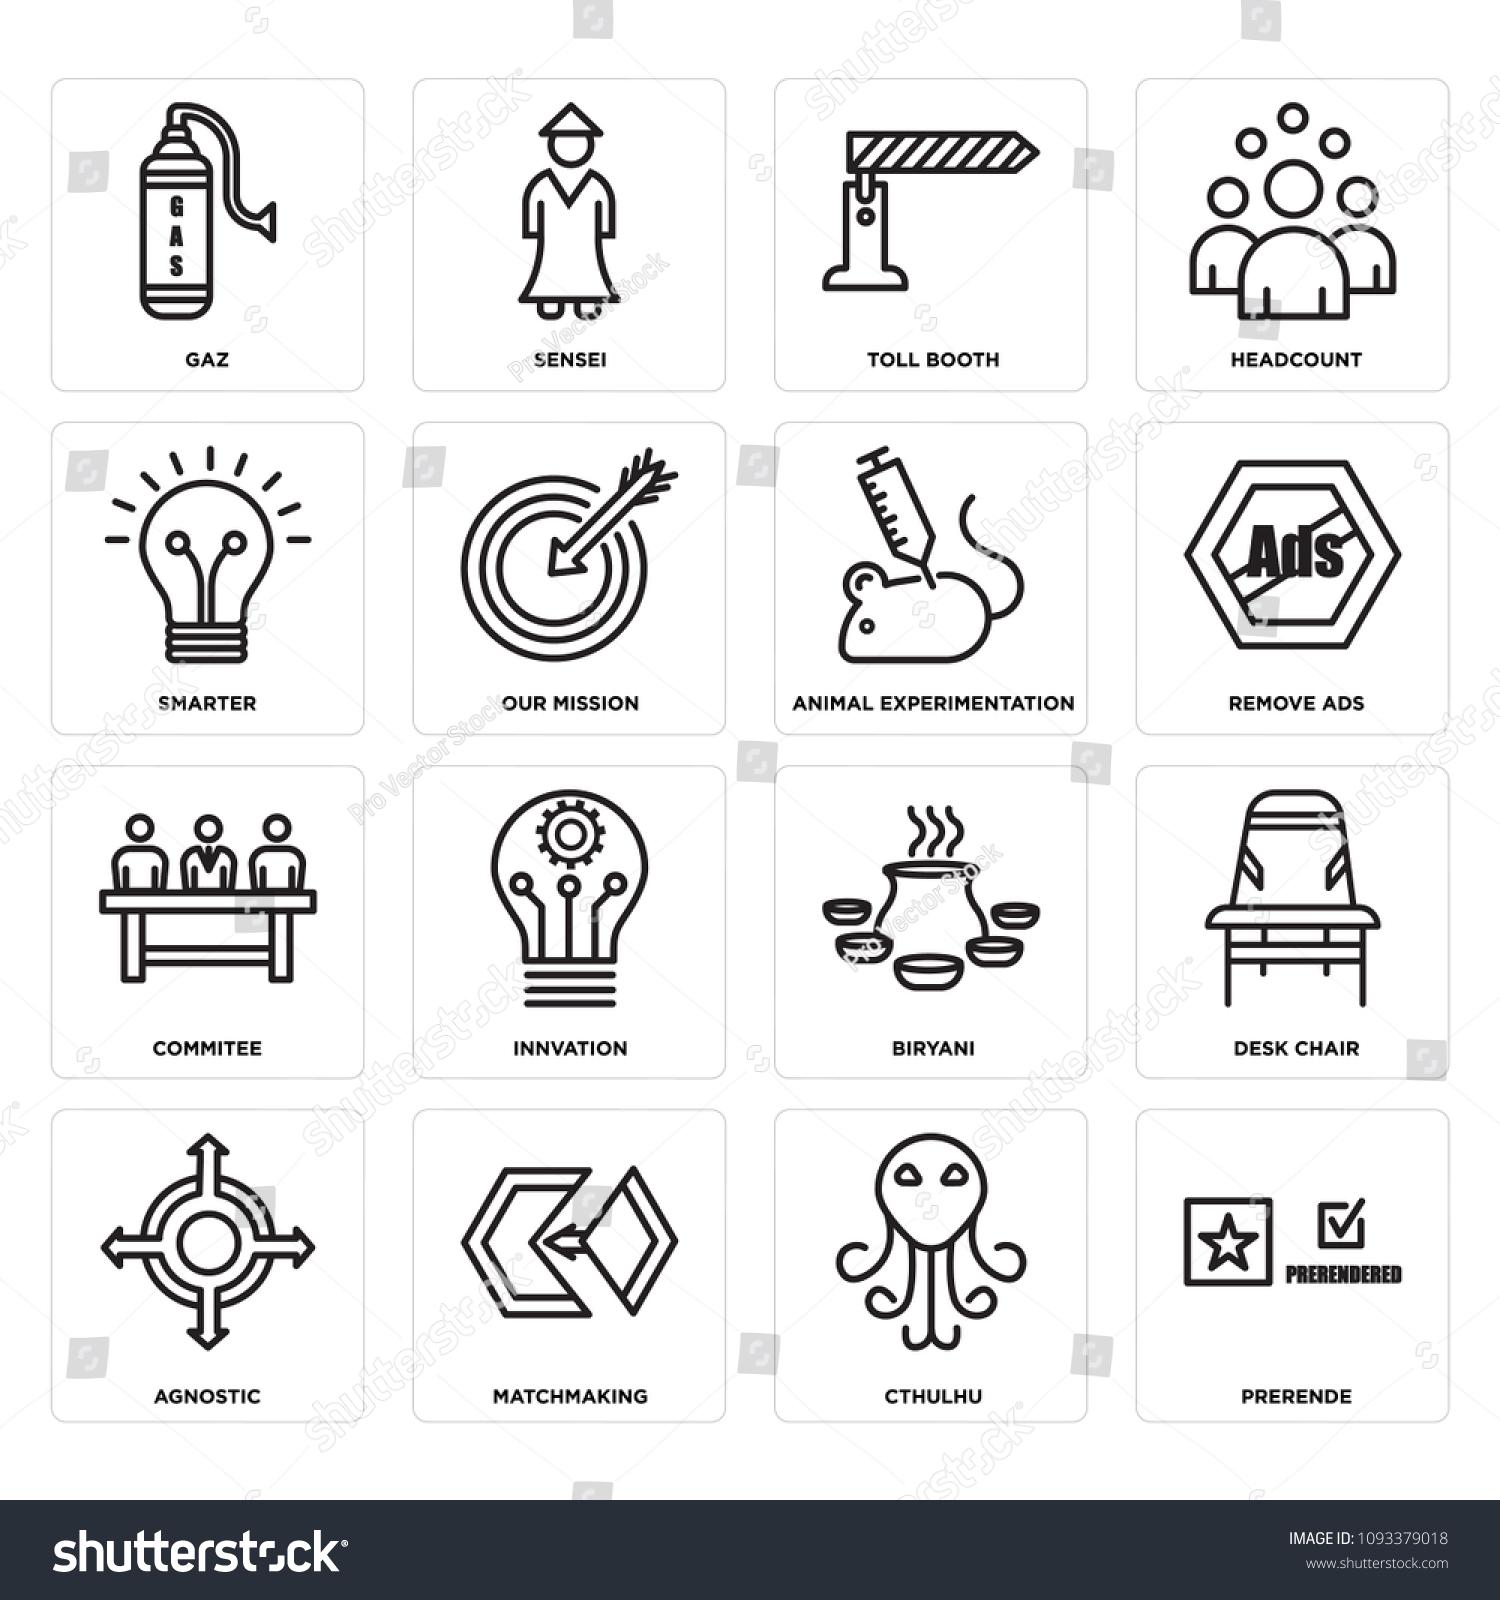 Matchmaking icons